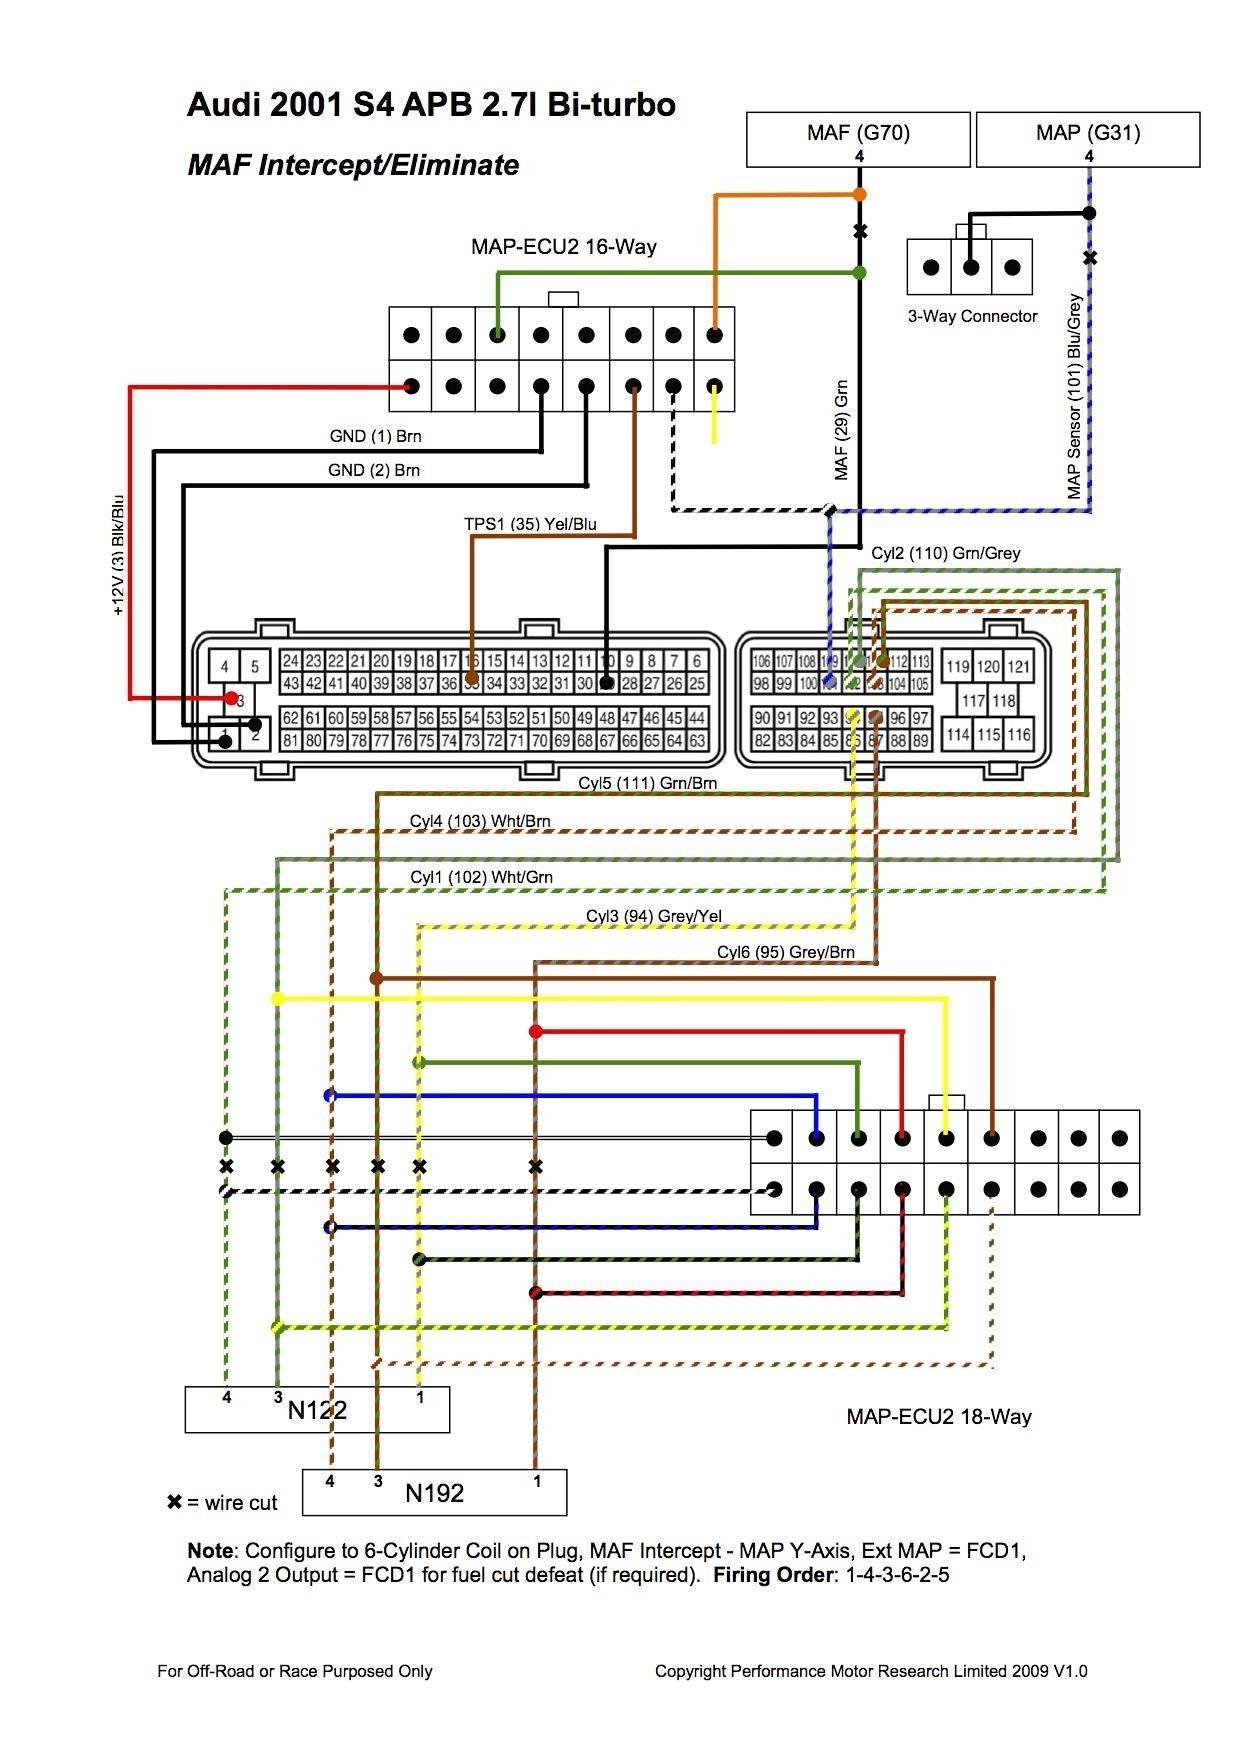 honda accord wiring diagram 2003 ct 1094  91 accord wiring diagram schematic wiring 2003 honda accord wiring harness diagram ct 1094  91 accord wiring diagram